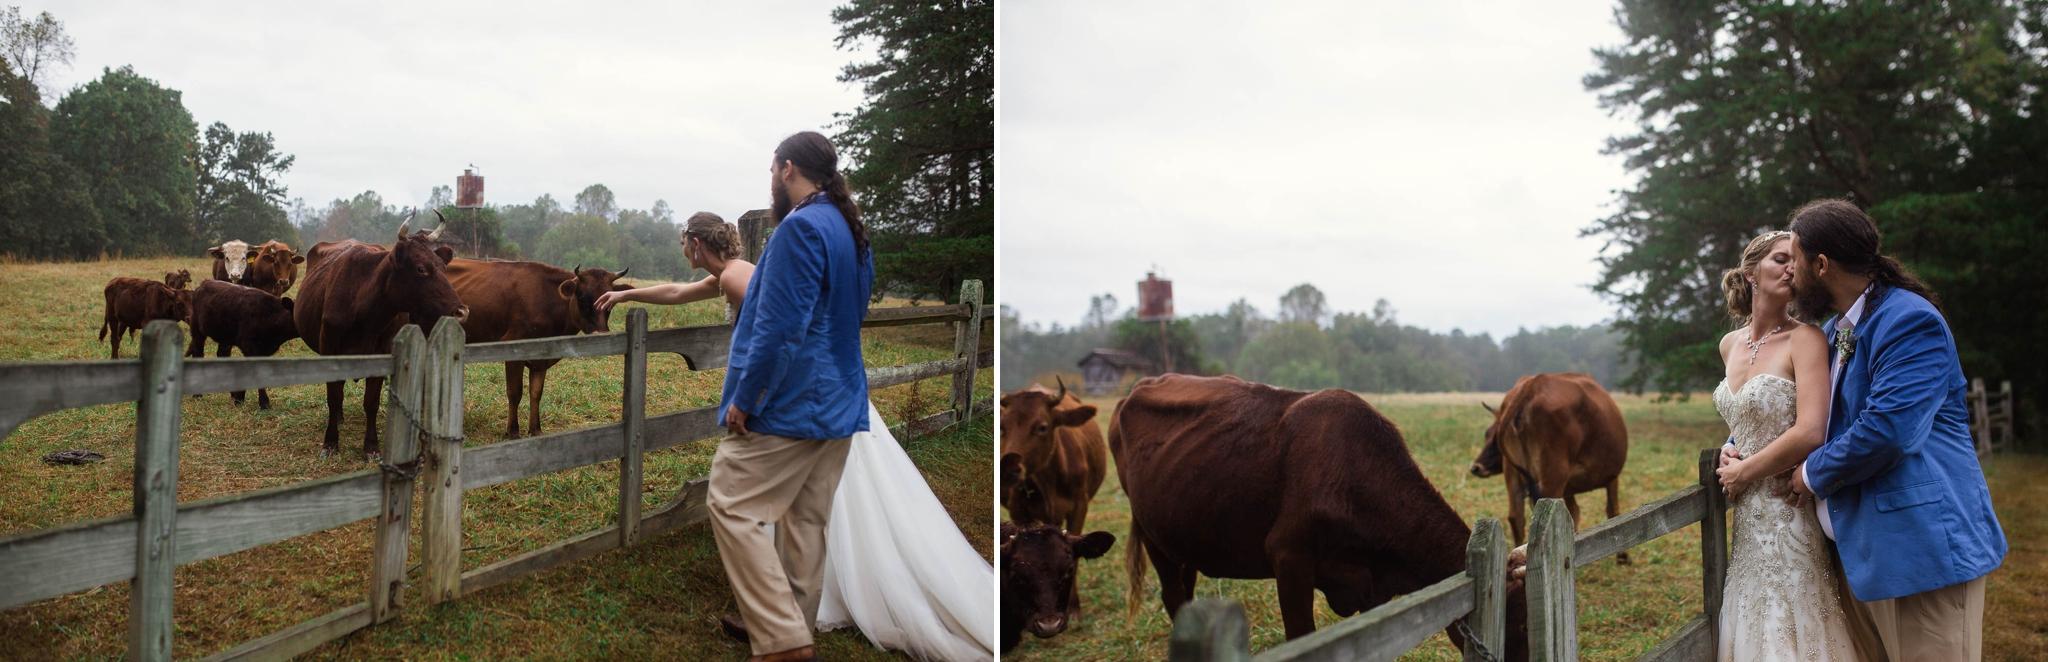 Wedding Photography at the Timberlake Earth Sanctuary in Whitsett, NC - Raleigh North Carolina Wedding Photographer 19.jpg